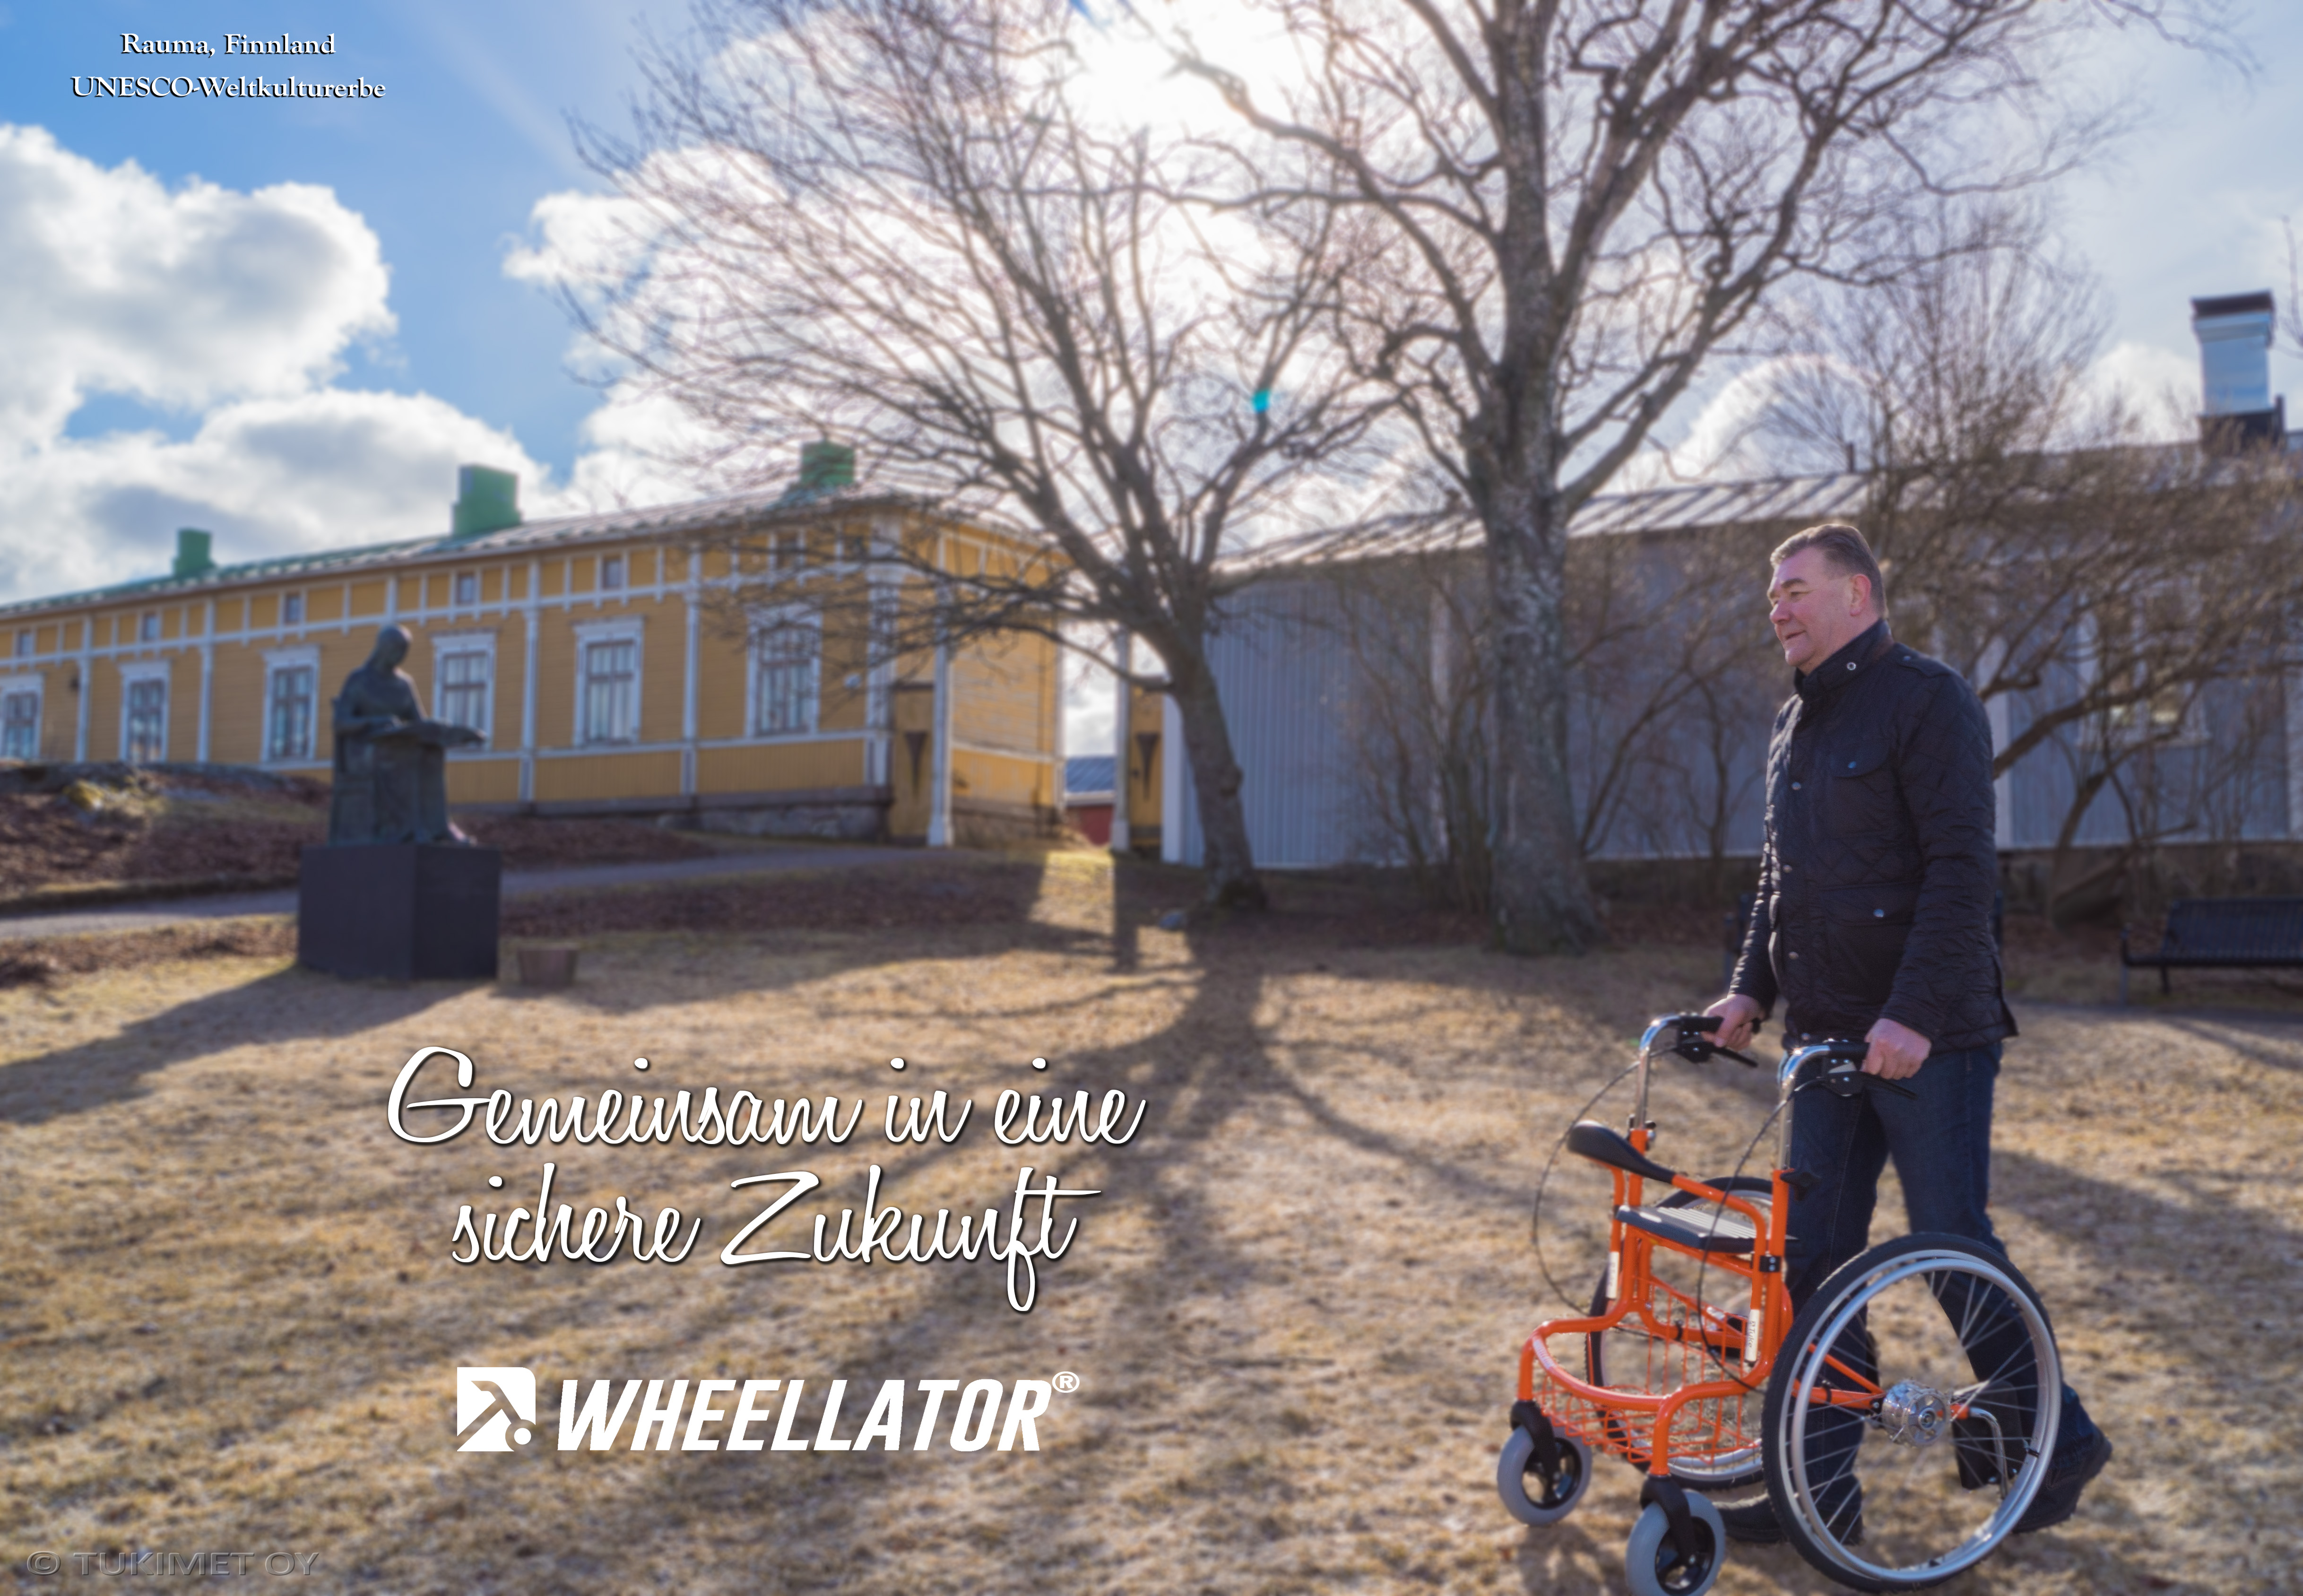 Wheellator_OldRauma8_Gemainsam